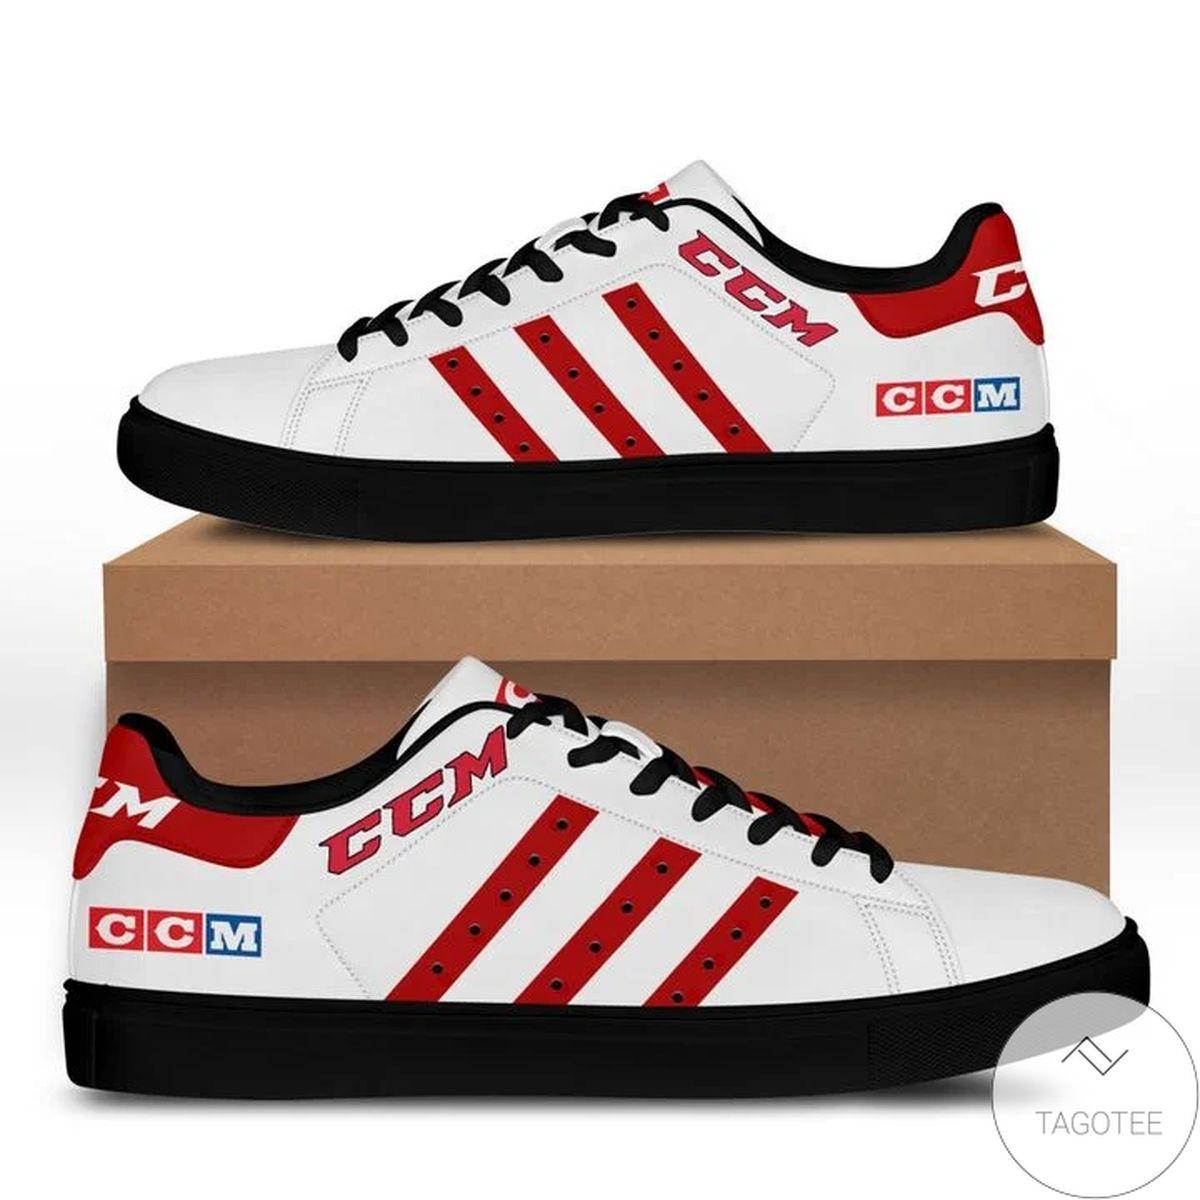 Ccm White Stan Smith Shoes